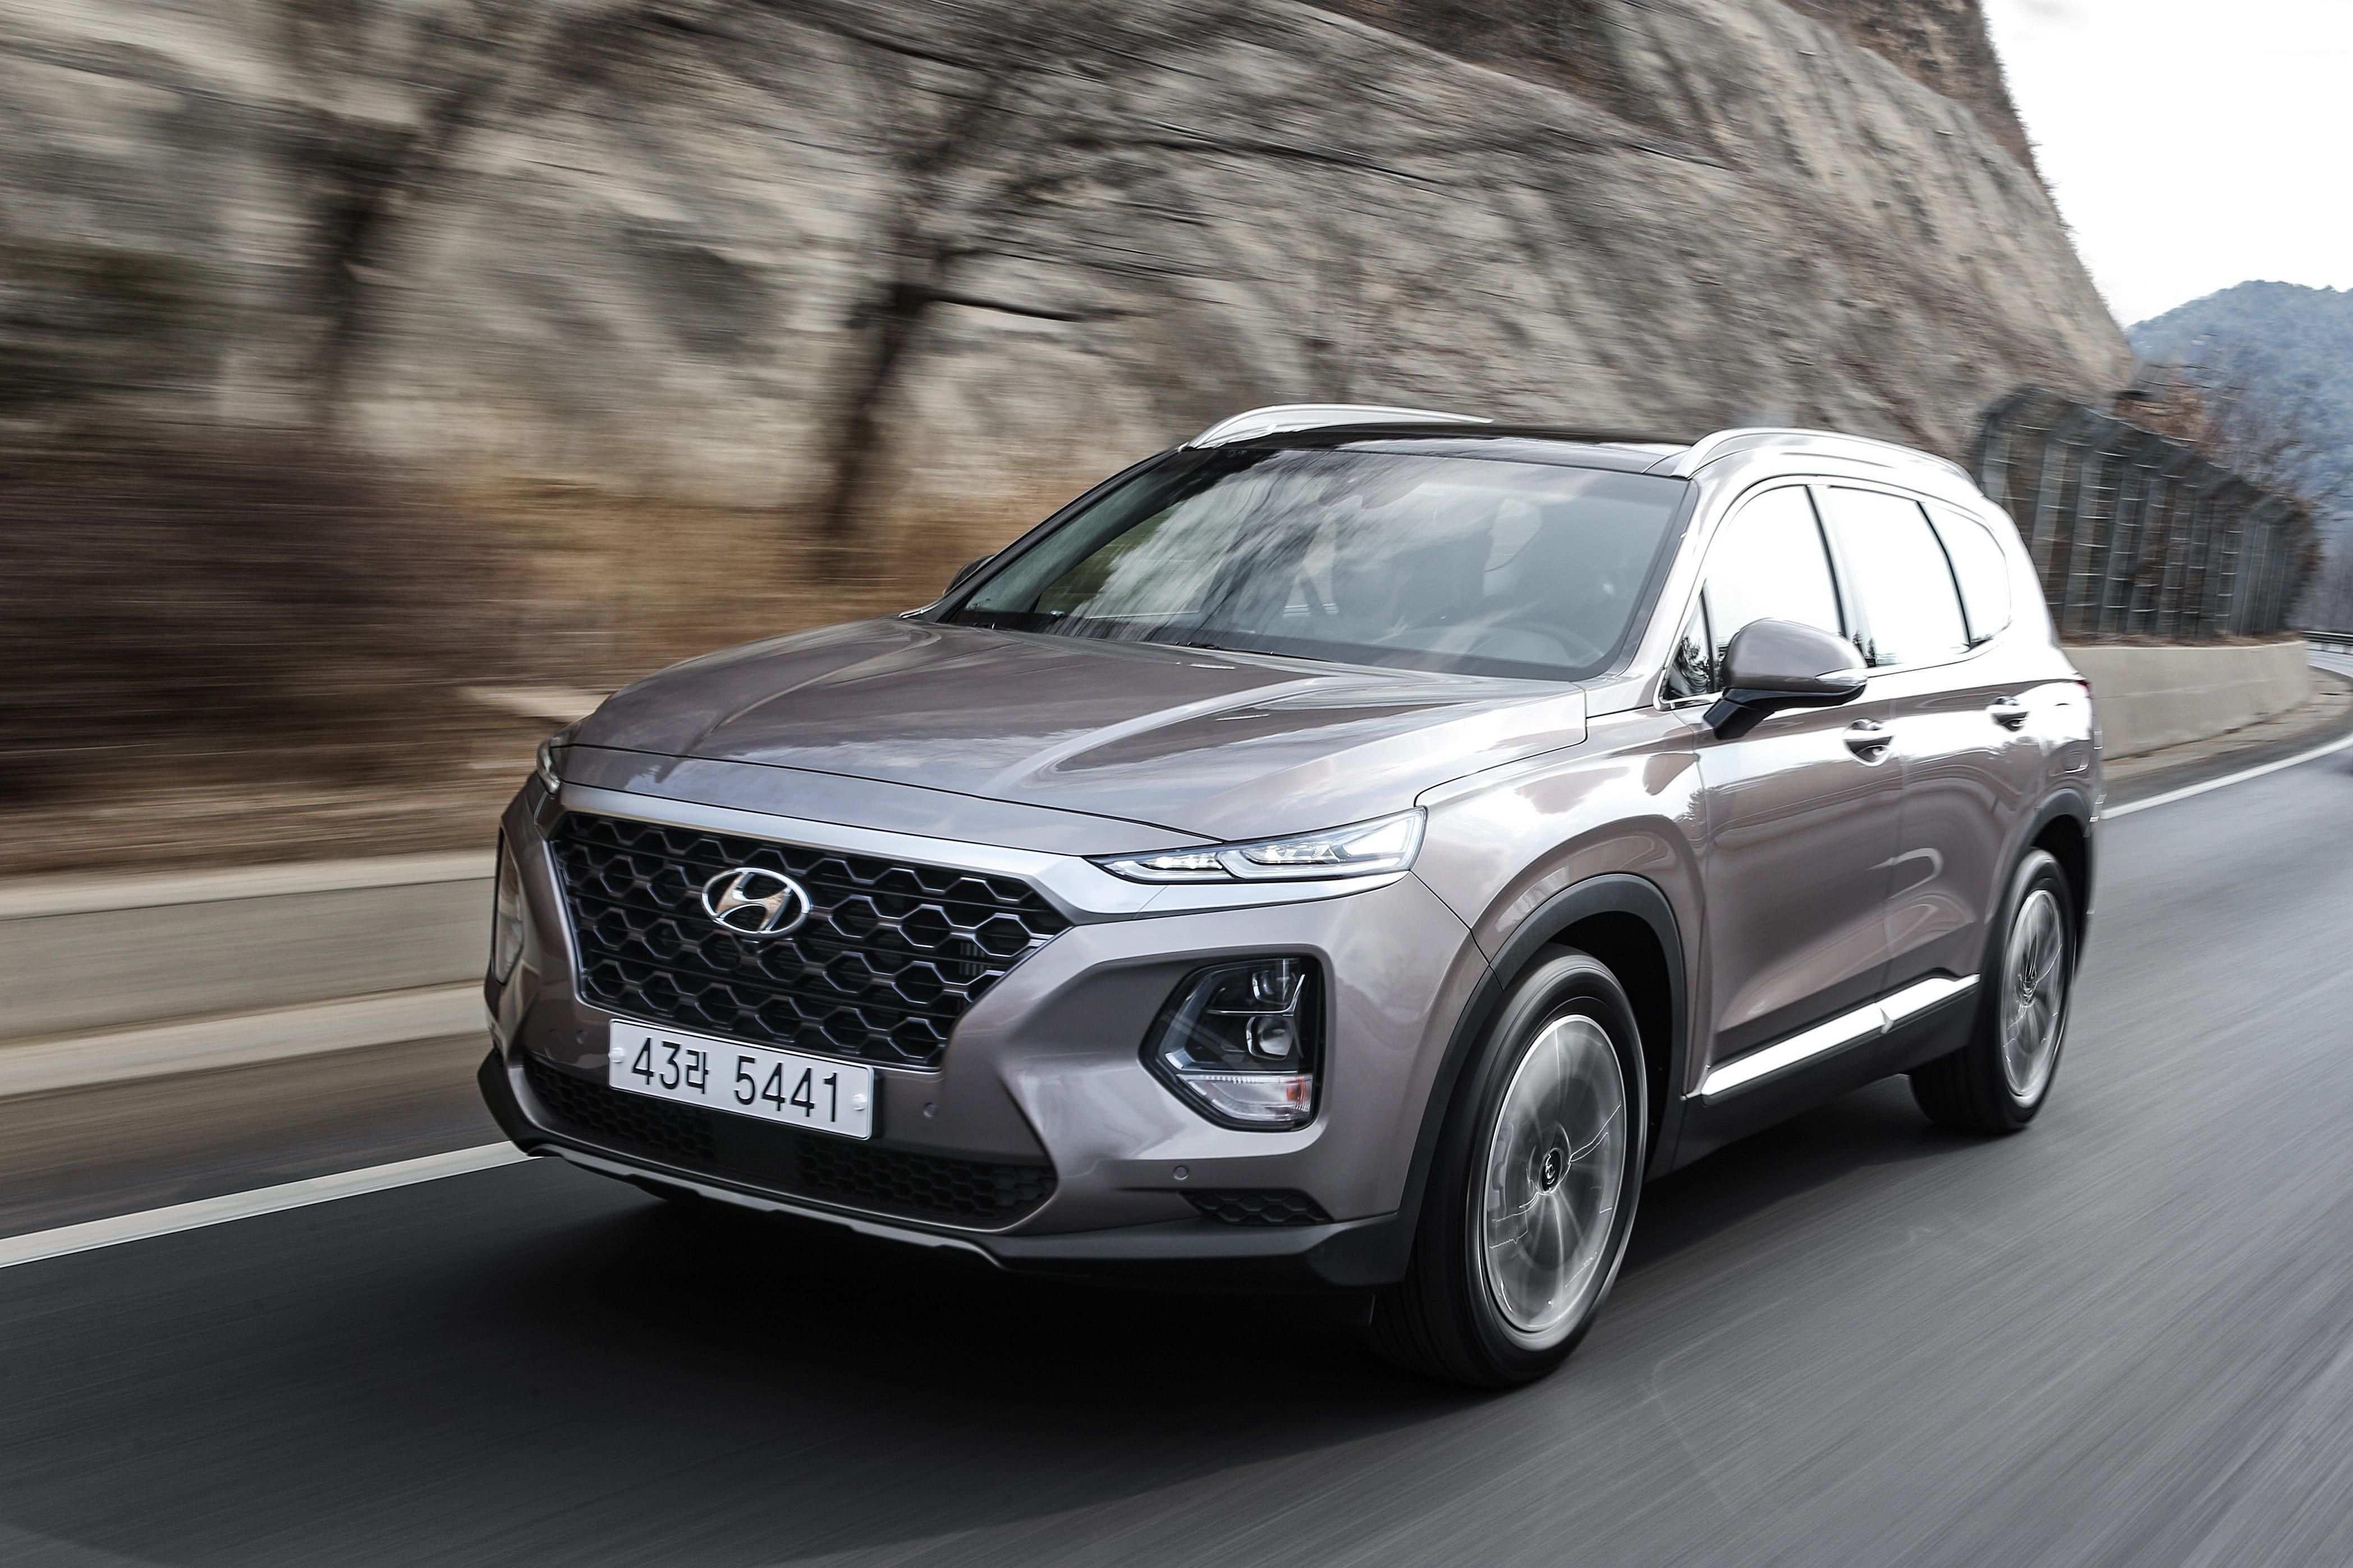 22 All New 2019 Hyundai Santa Fe Launch Spesification with 2019 Hyundai Santa Fe Launch